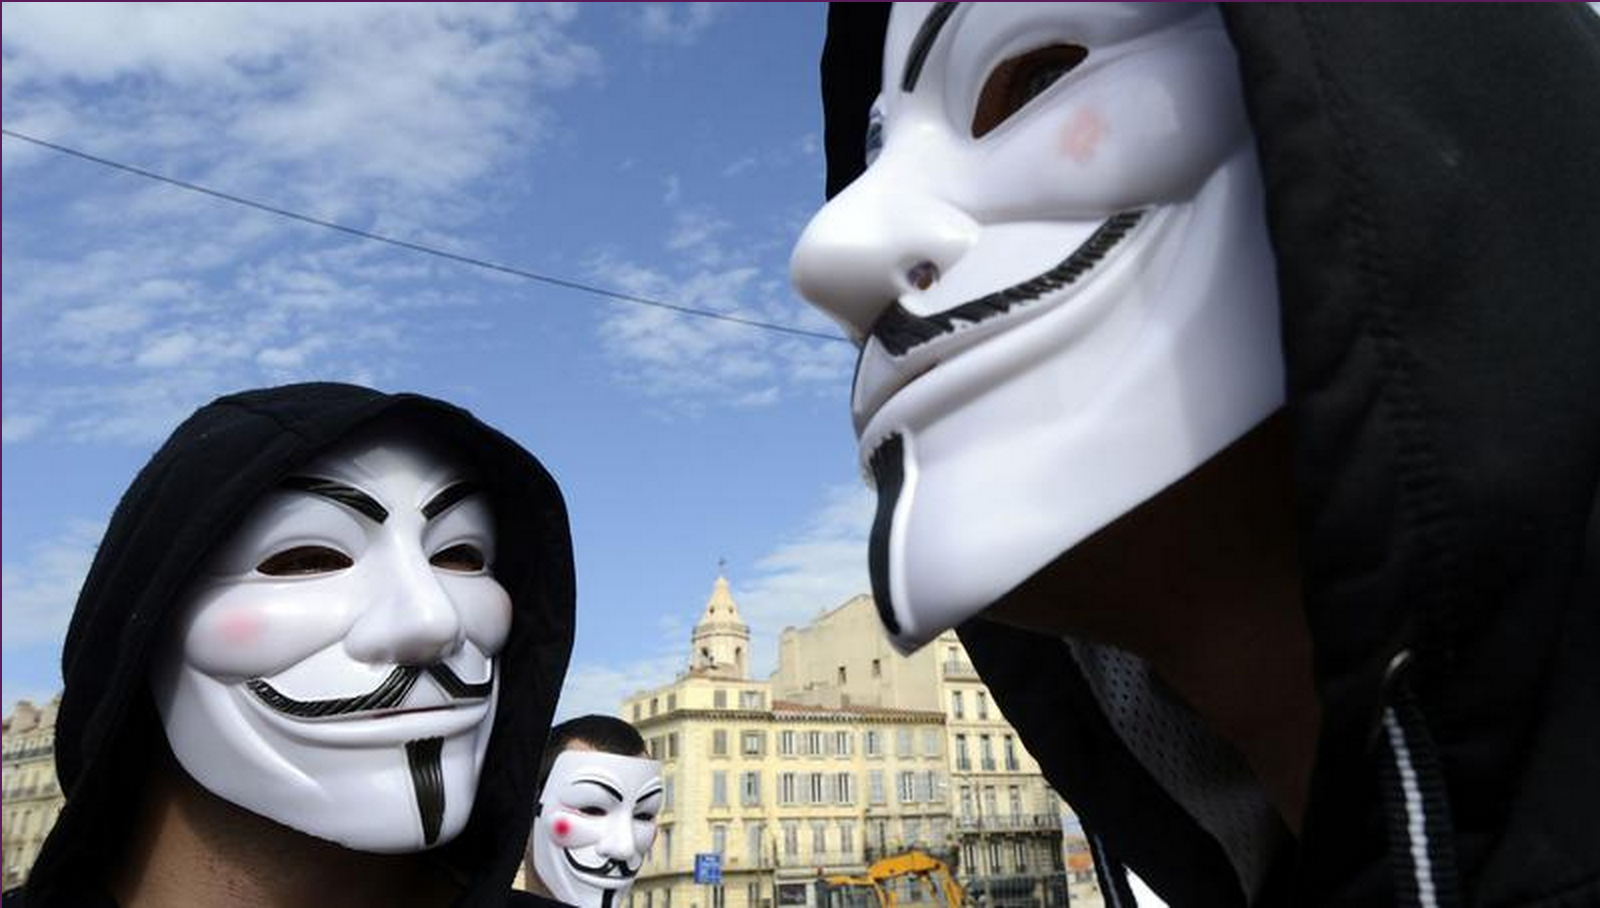 Anonymous members